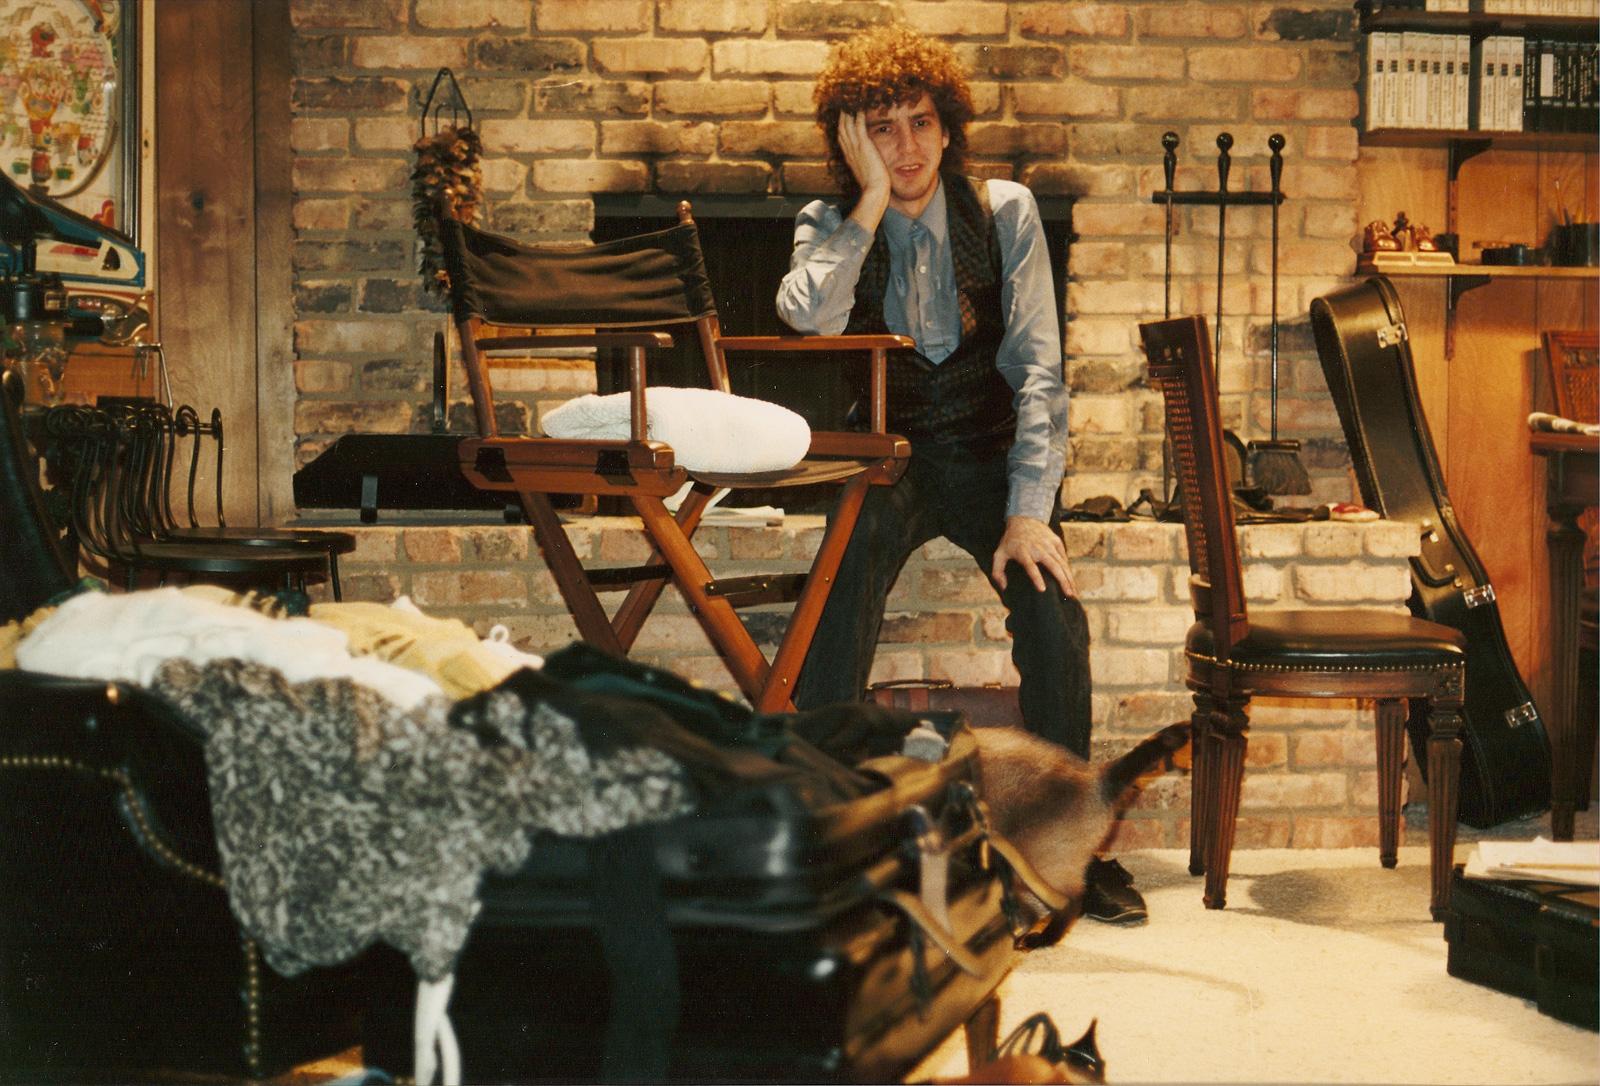 Magic Marc at Home  Minneapolis,Minnesota / June, 1989  Photo by Debra Rodman